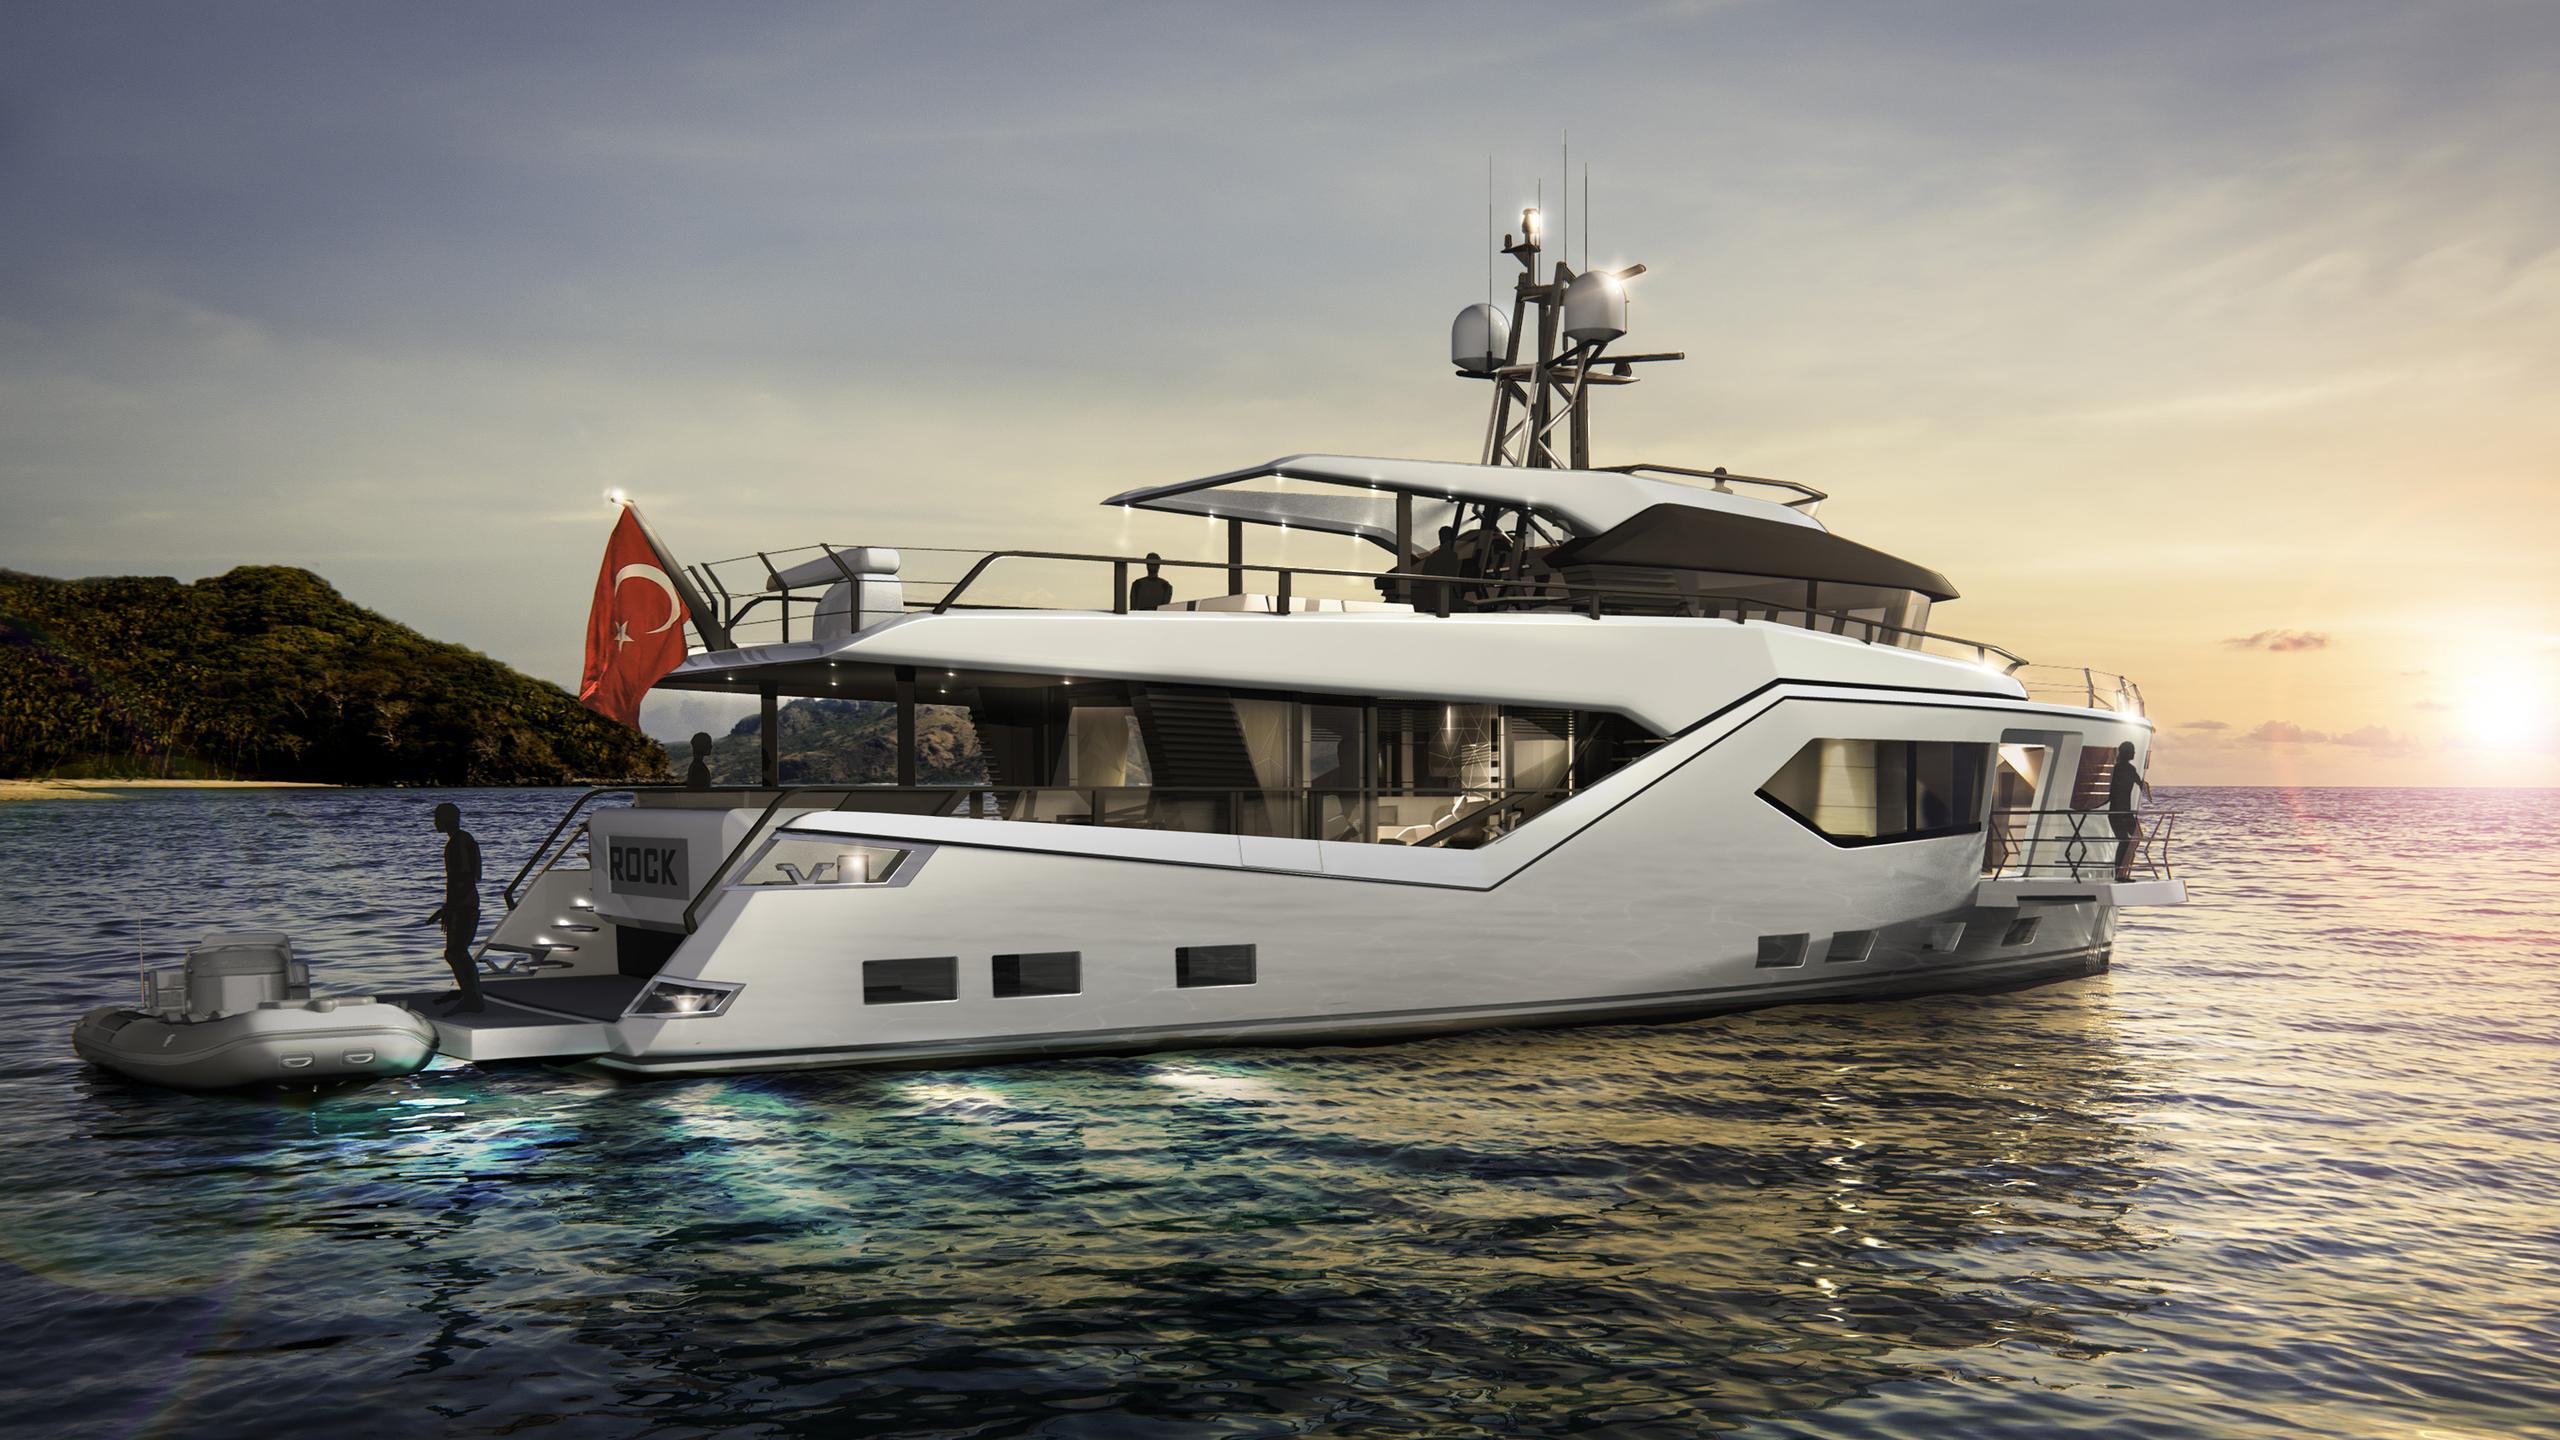 rock motoryacht evadne yachts 24m 2018 rendering half stern